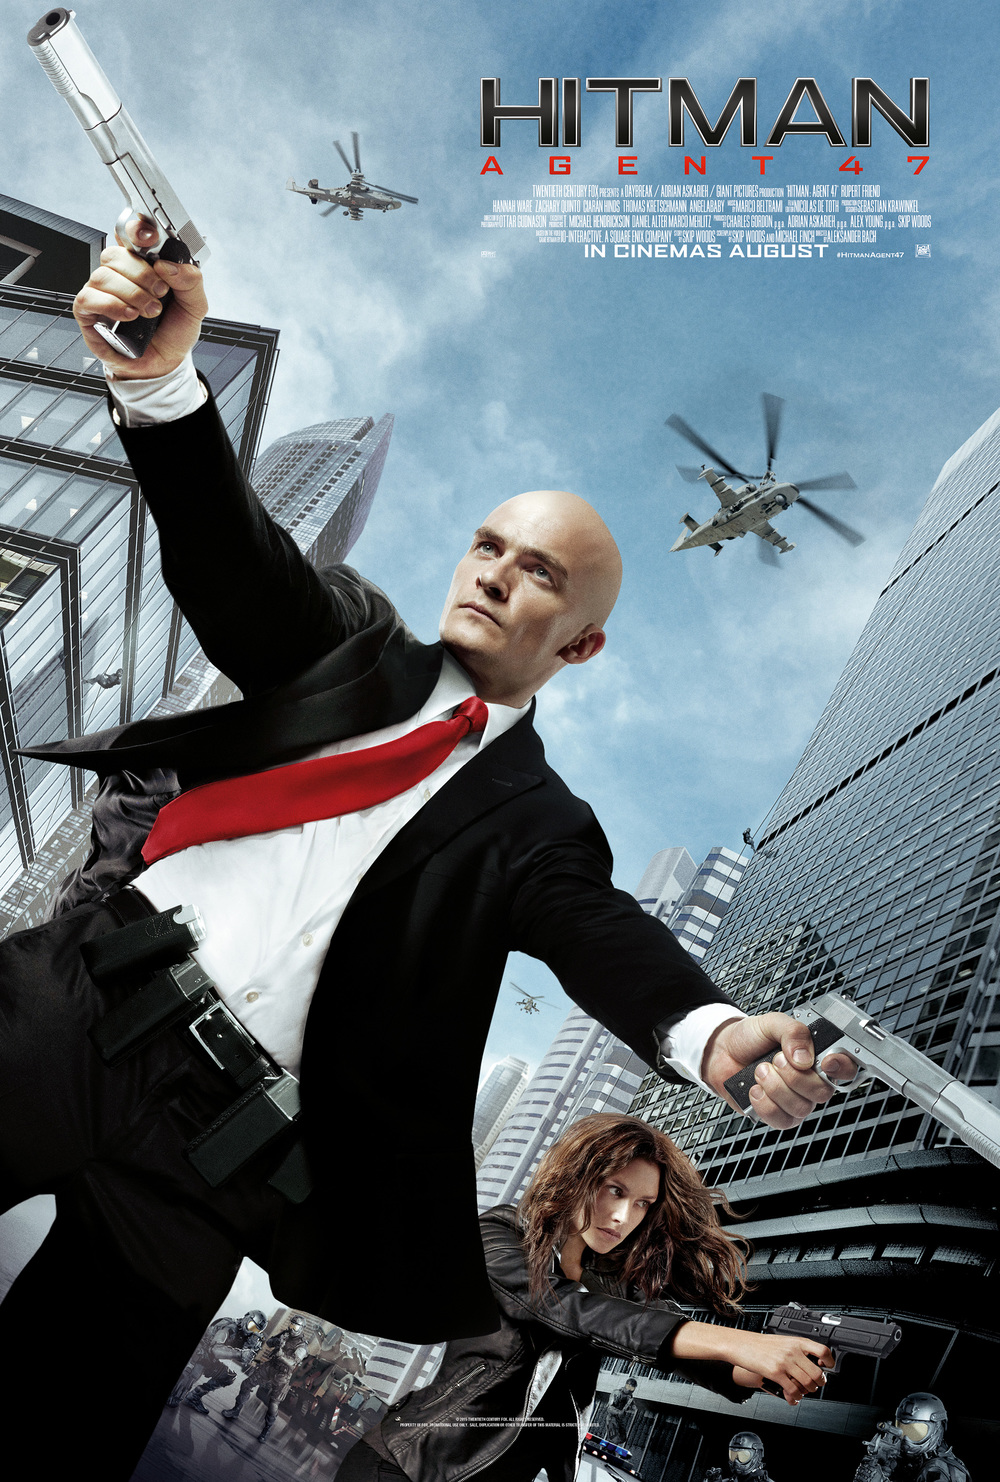 Above: Hitman: Agent 47 (2015) poster. Below: Hitman (2007) poster.